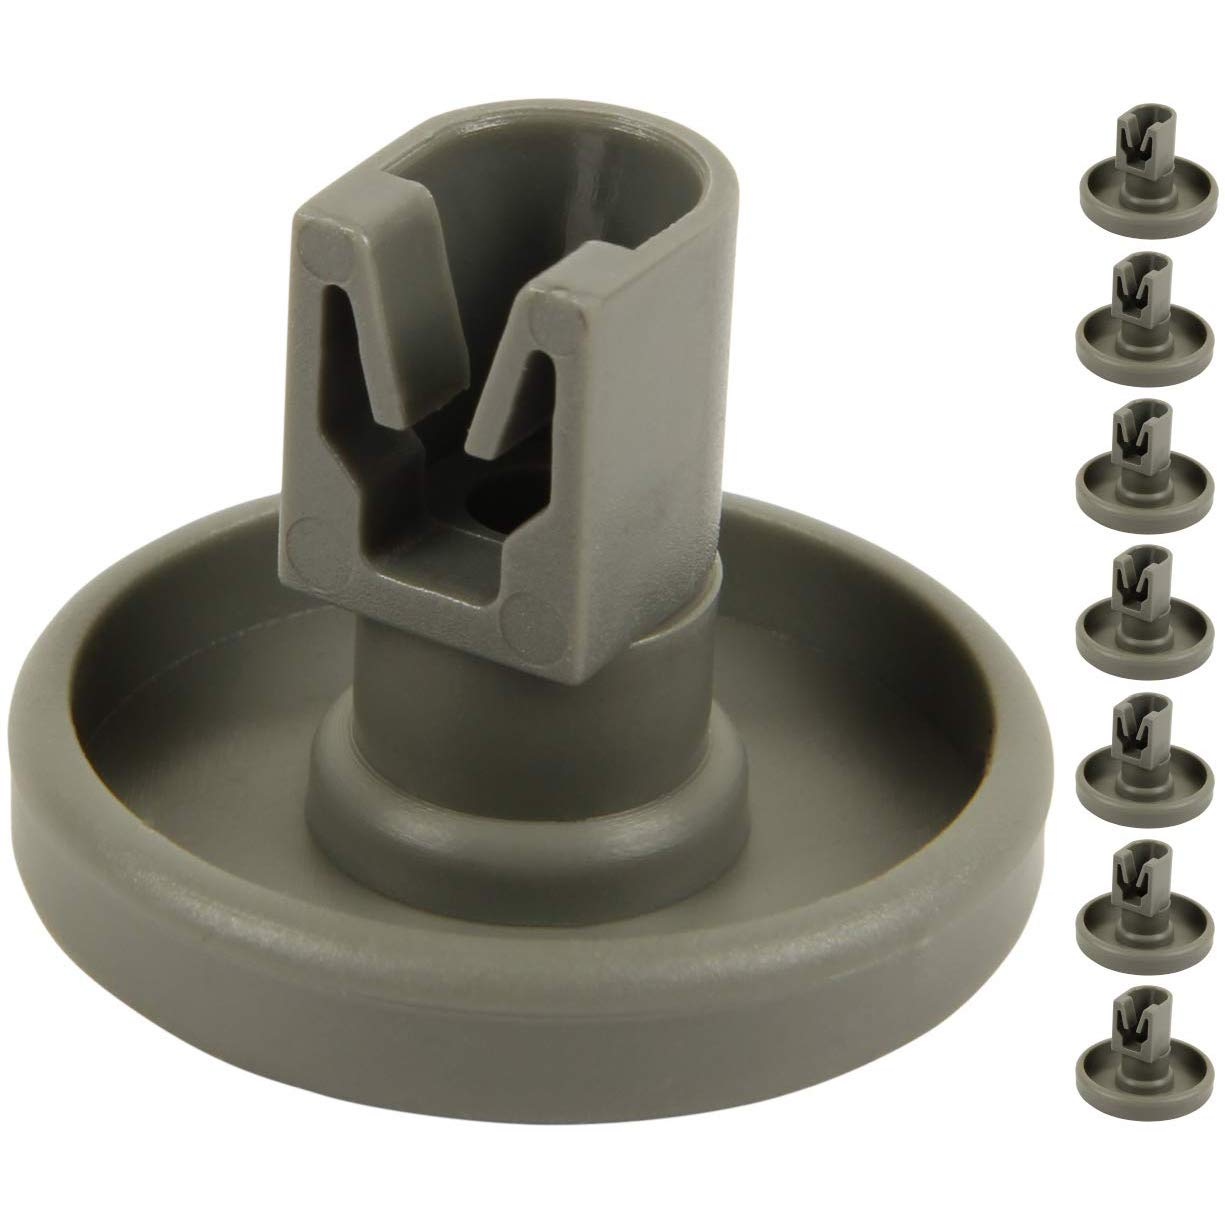 SODIAL Dishwasher Baskets Content: 8 pieces Suitable For Aeg Favorit, Privileg, Zanussi, etc